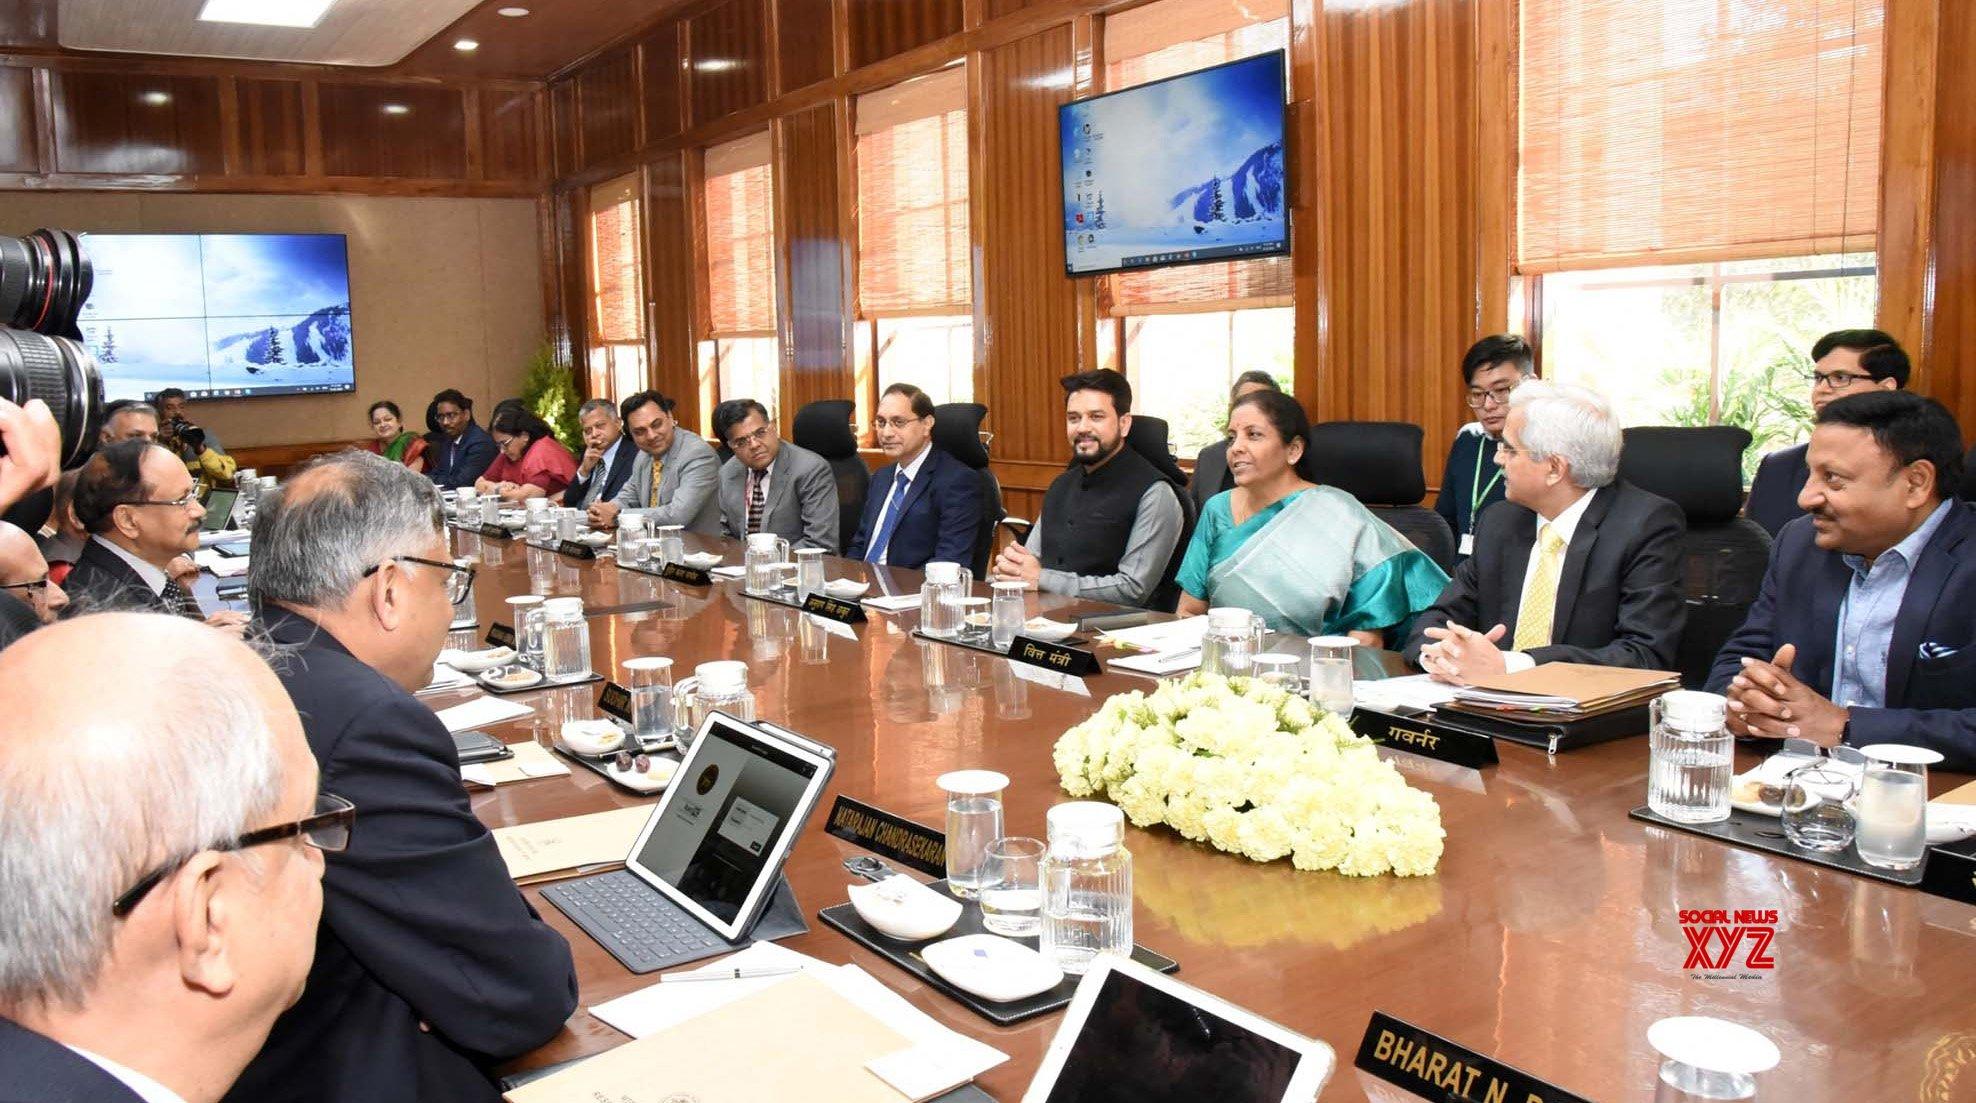 New Delhi: Meeting of Central Board of Directors of RBI - Nirmala Sitharaman #Gallery